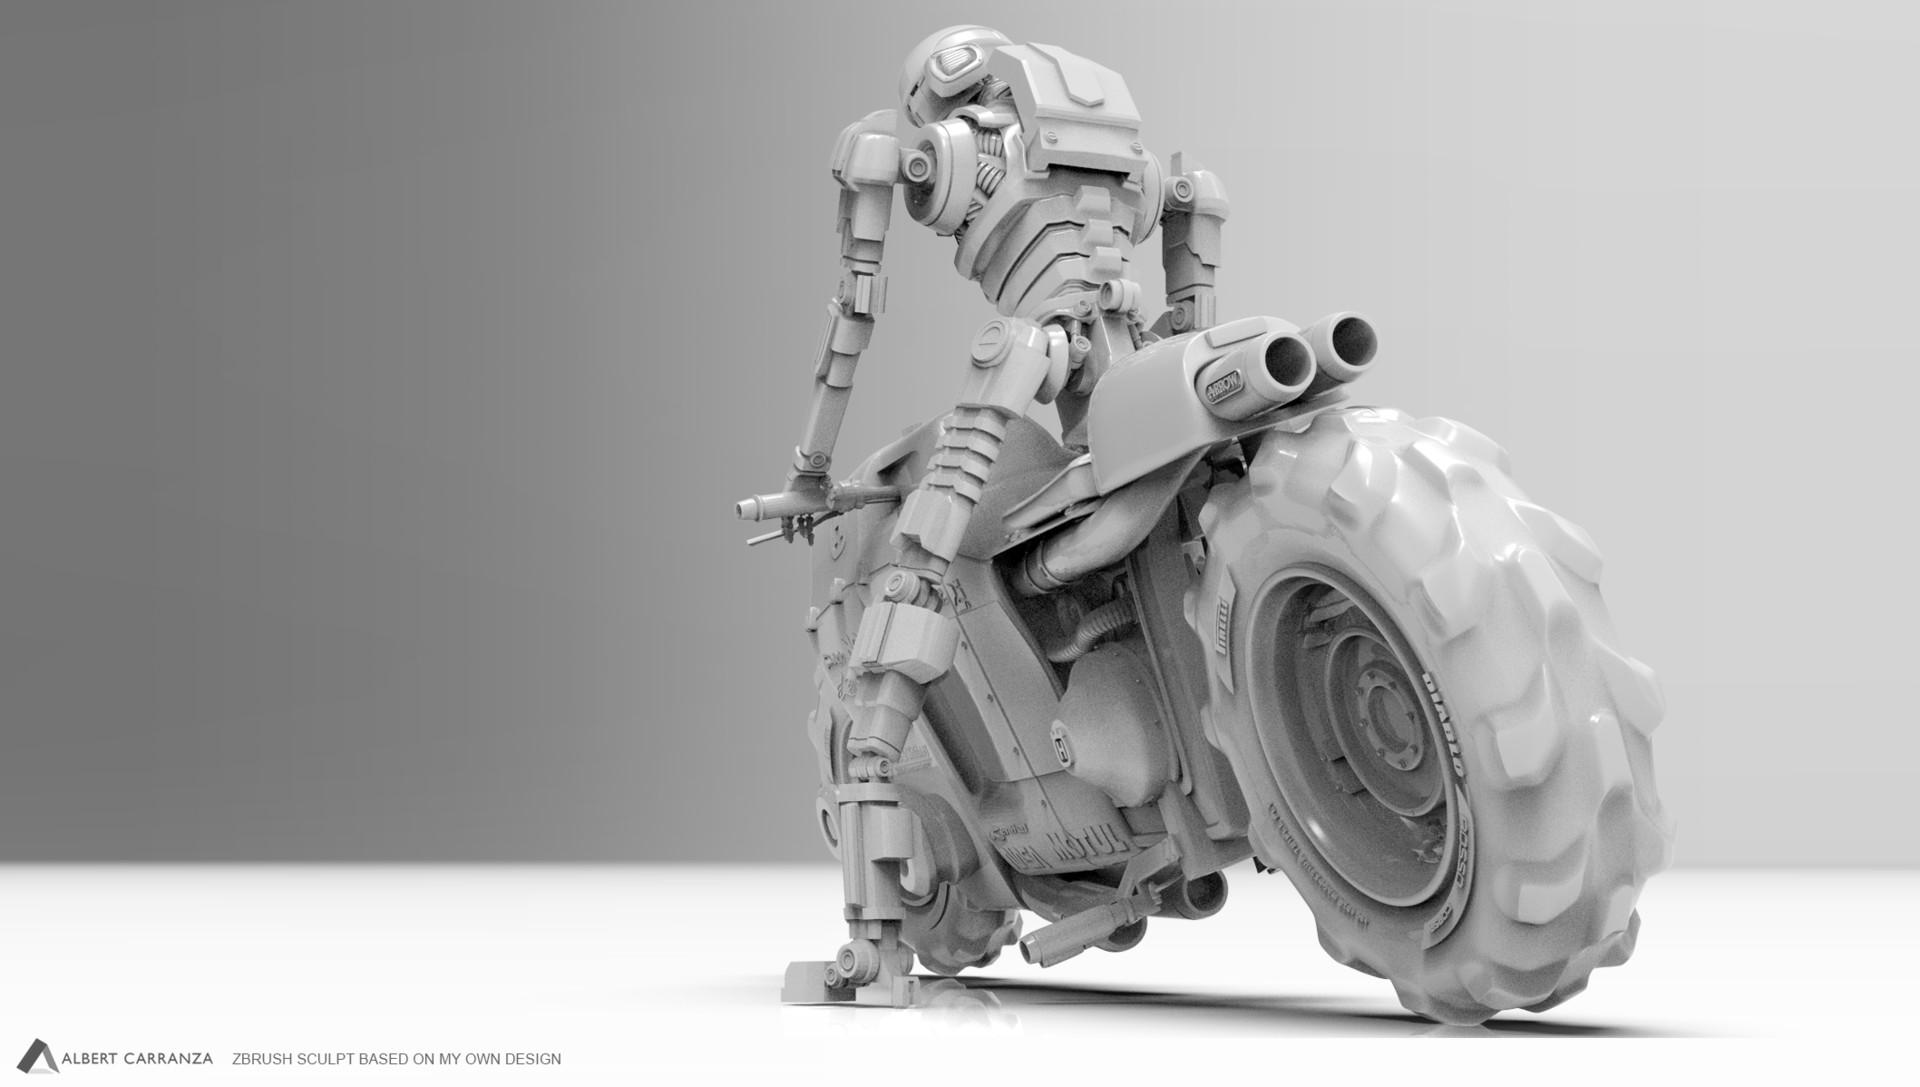 Albert carranza droneandbike2